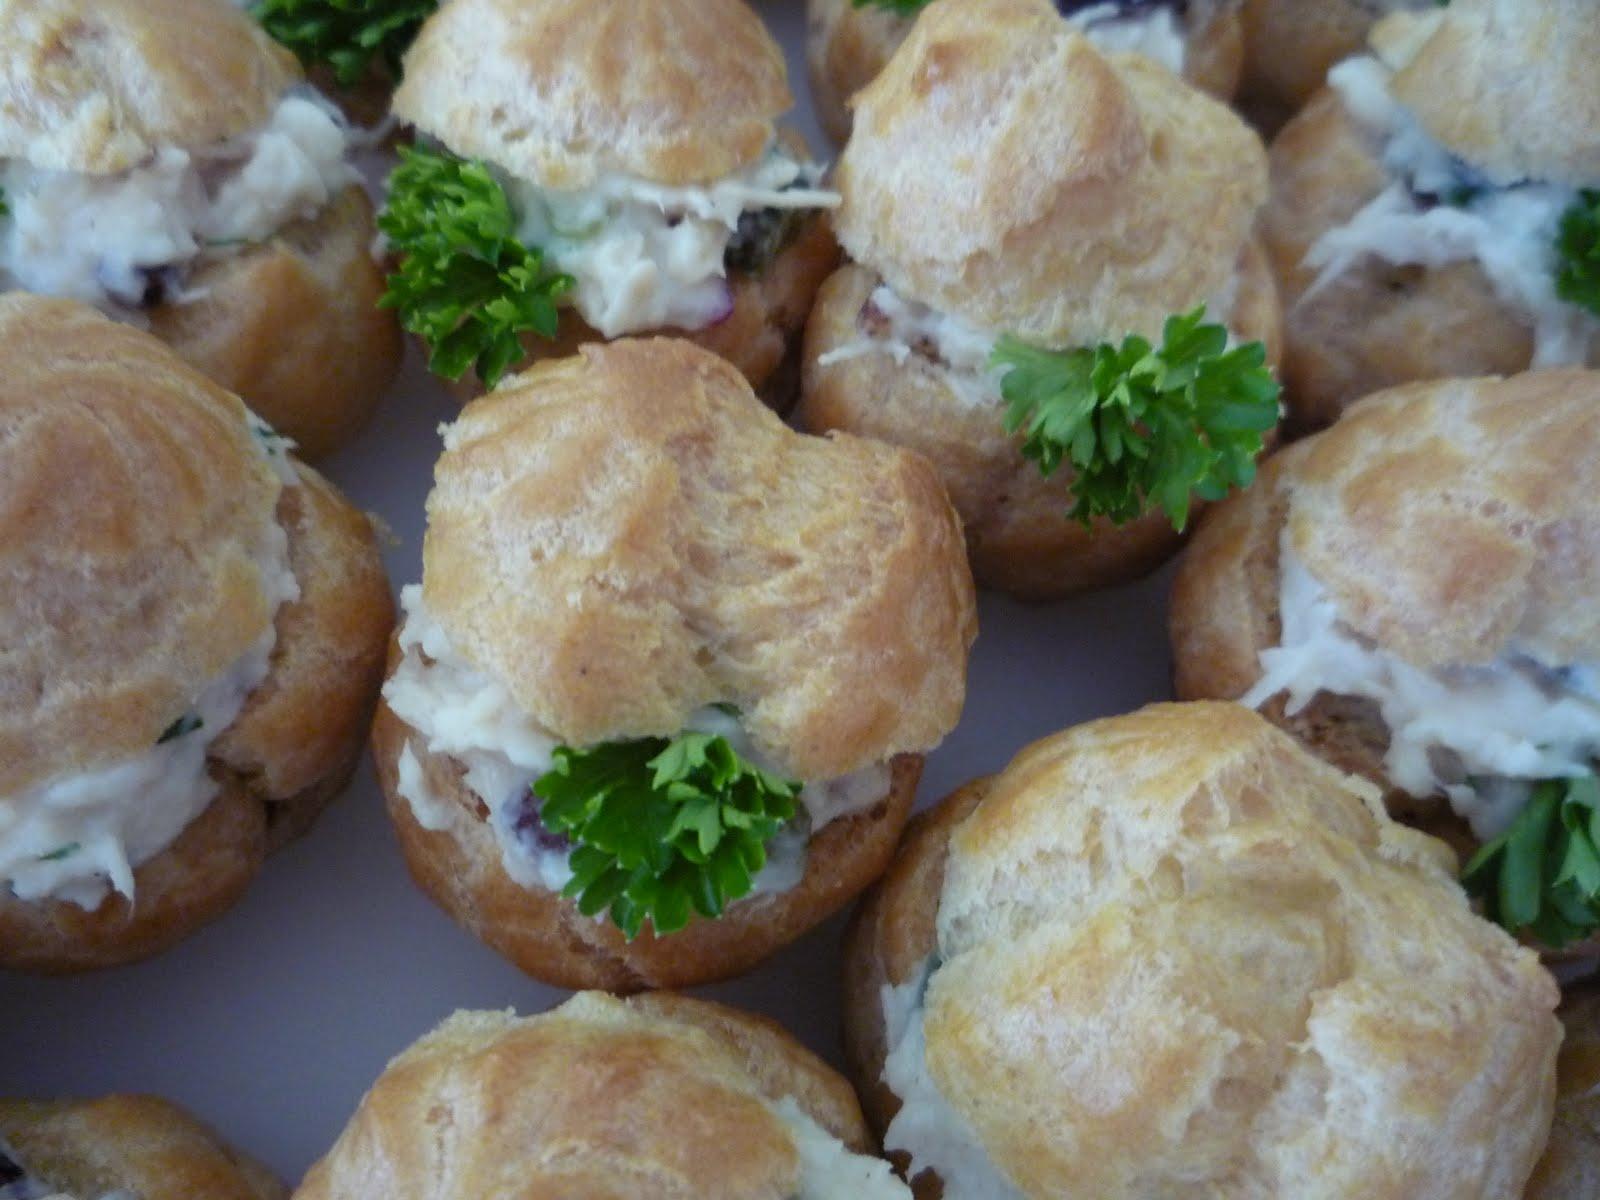 The Quail's Nest: Savory Mini Cream Puffs